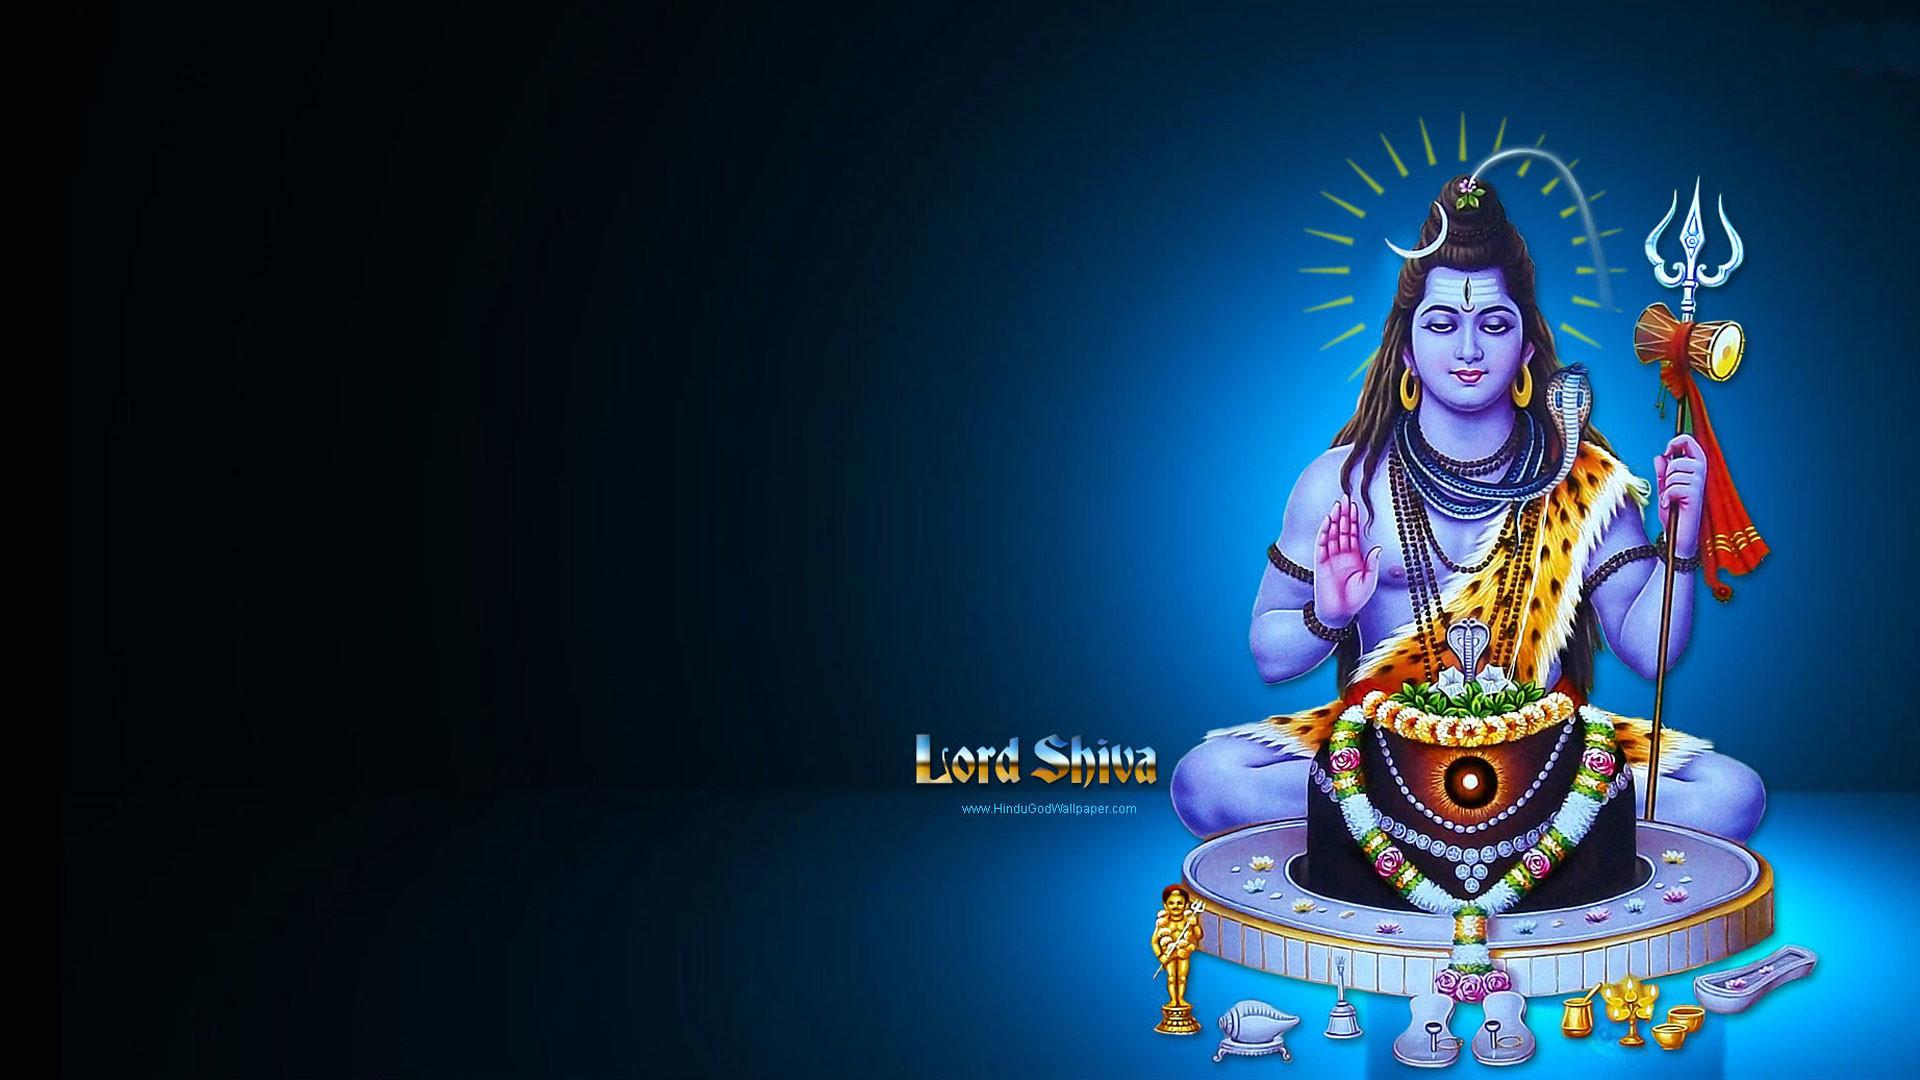 hd pics photos gods lord shiva mahadev new attractive desktop background  wallpaper